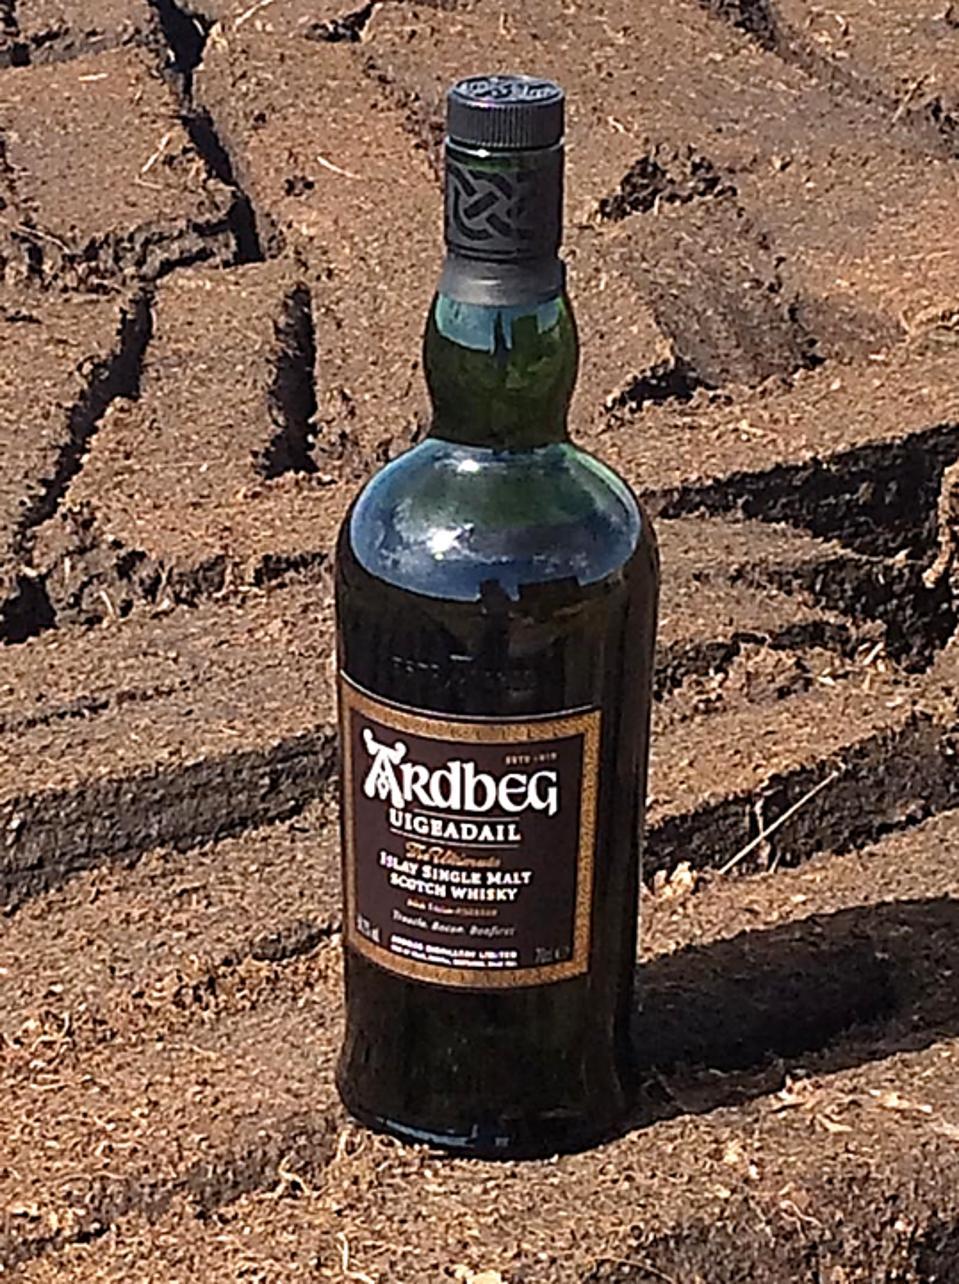 A Bottle of Ardbeg Uigeadail surrounded by newly harvested bricks of peat on Islay